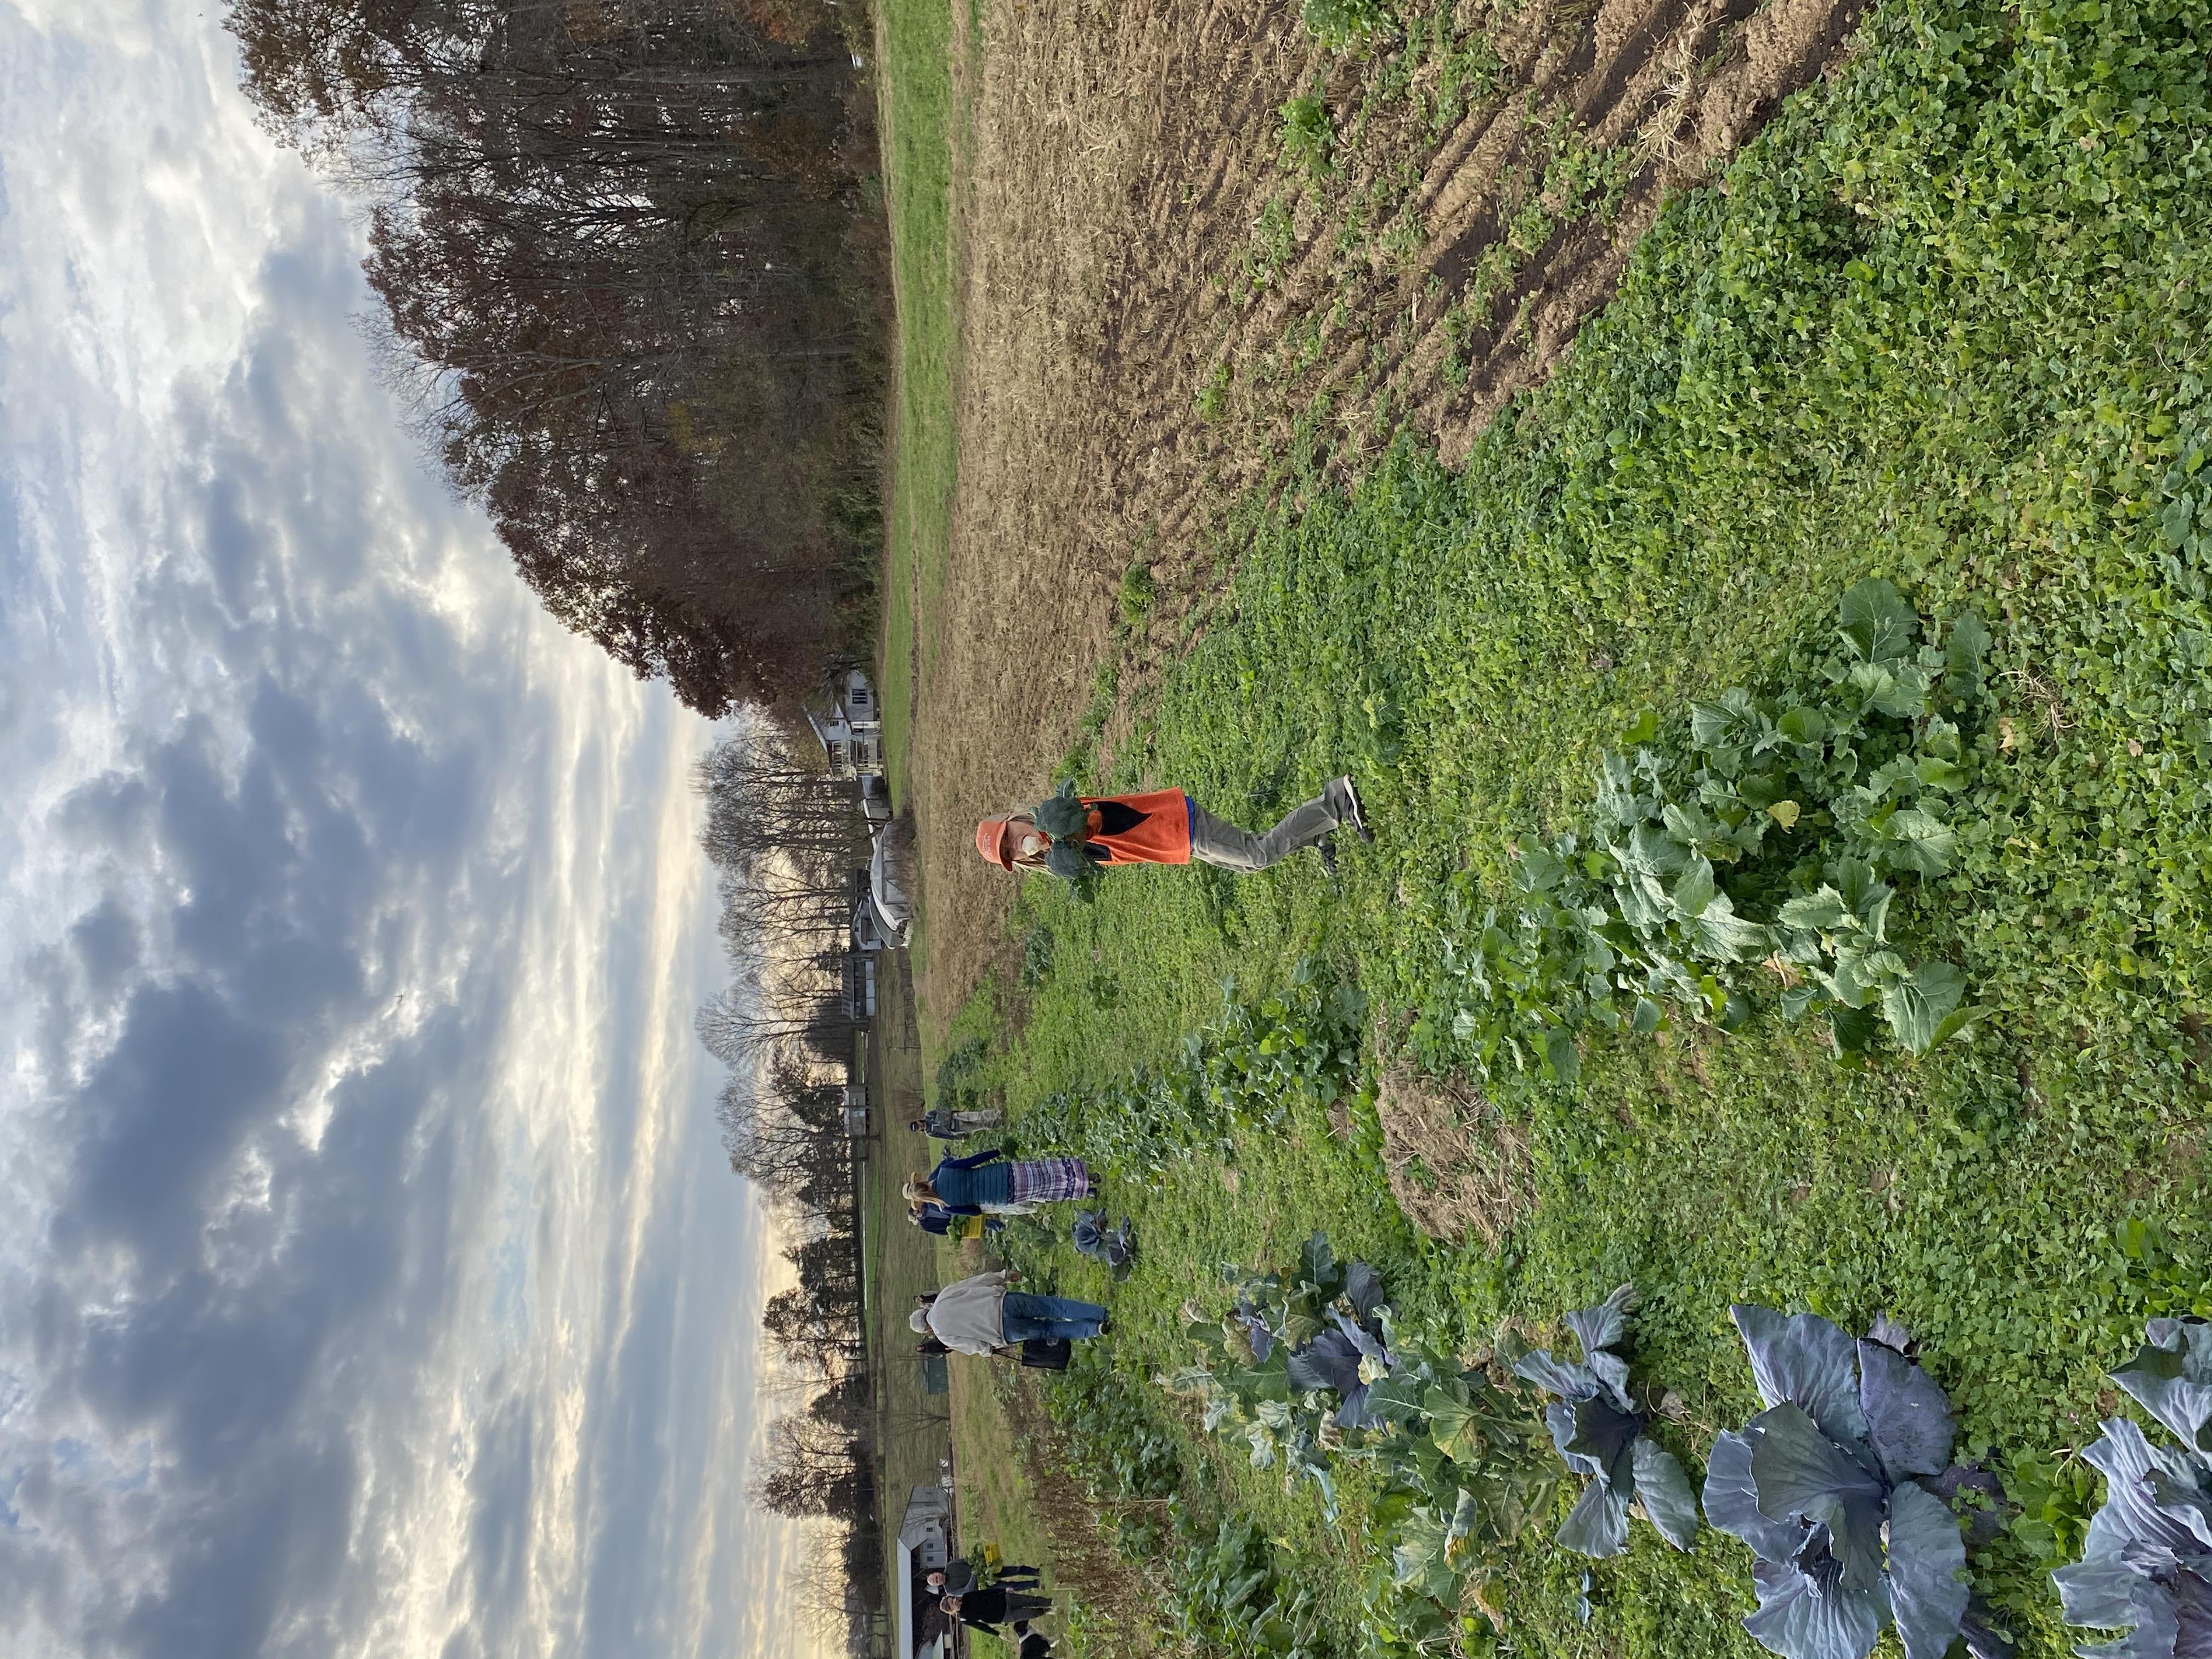 Farm Happenings for October 5, 2021